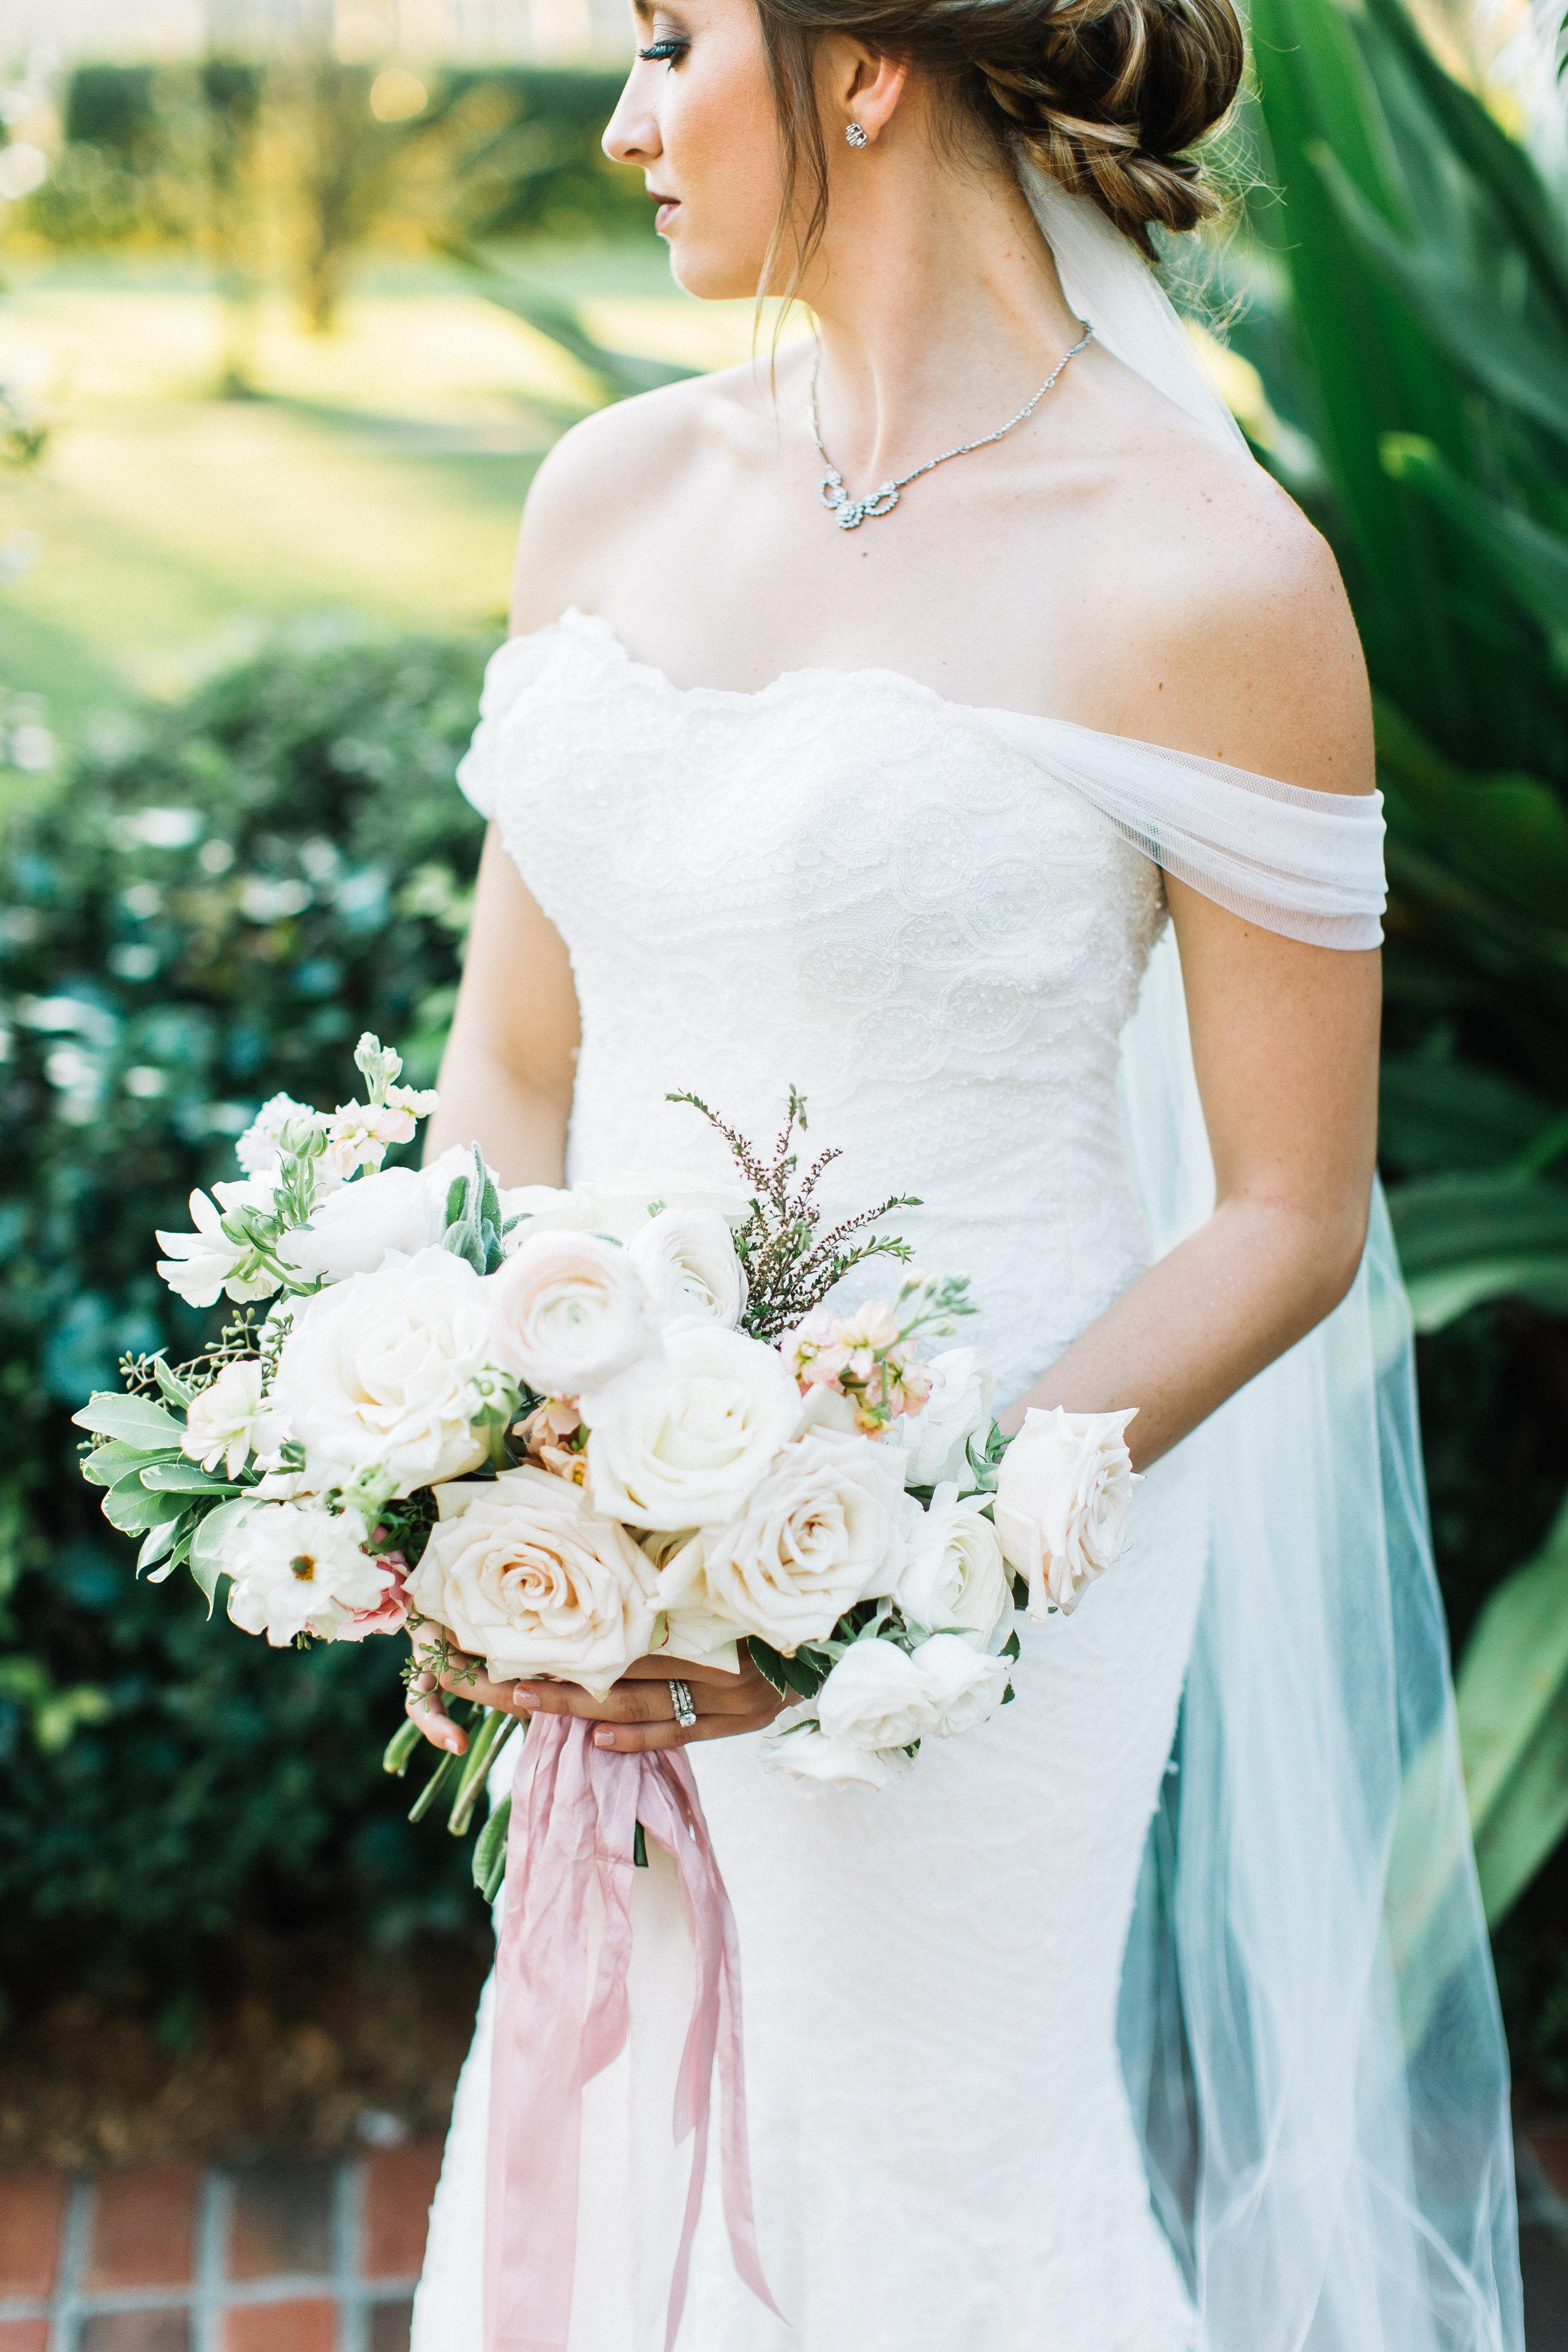 Mike_Alexis_Cypress_Grove_Estate_Wedding-479.jpg